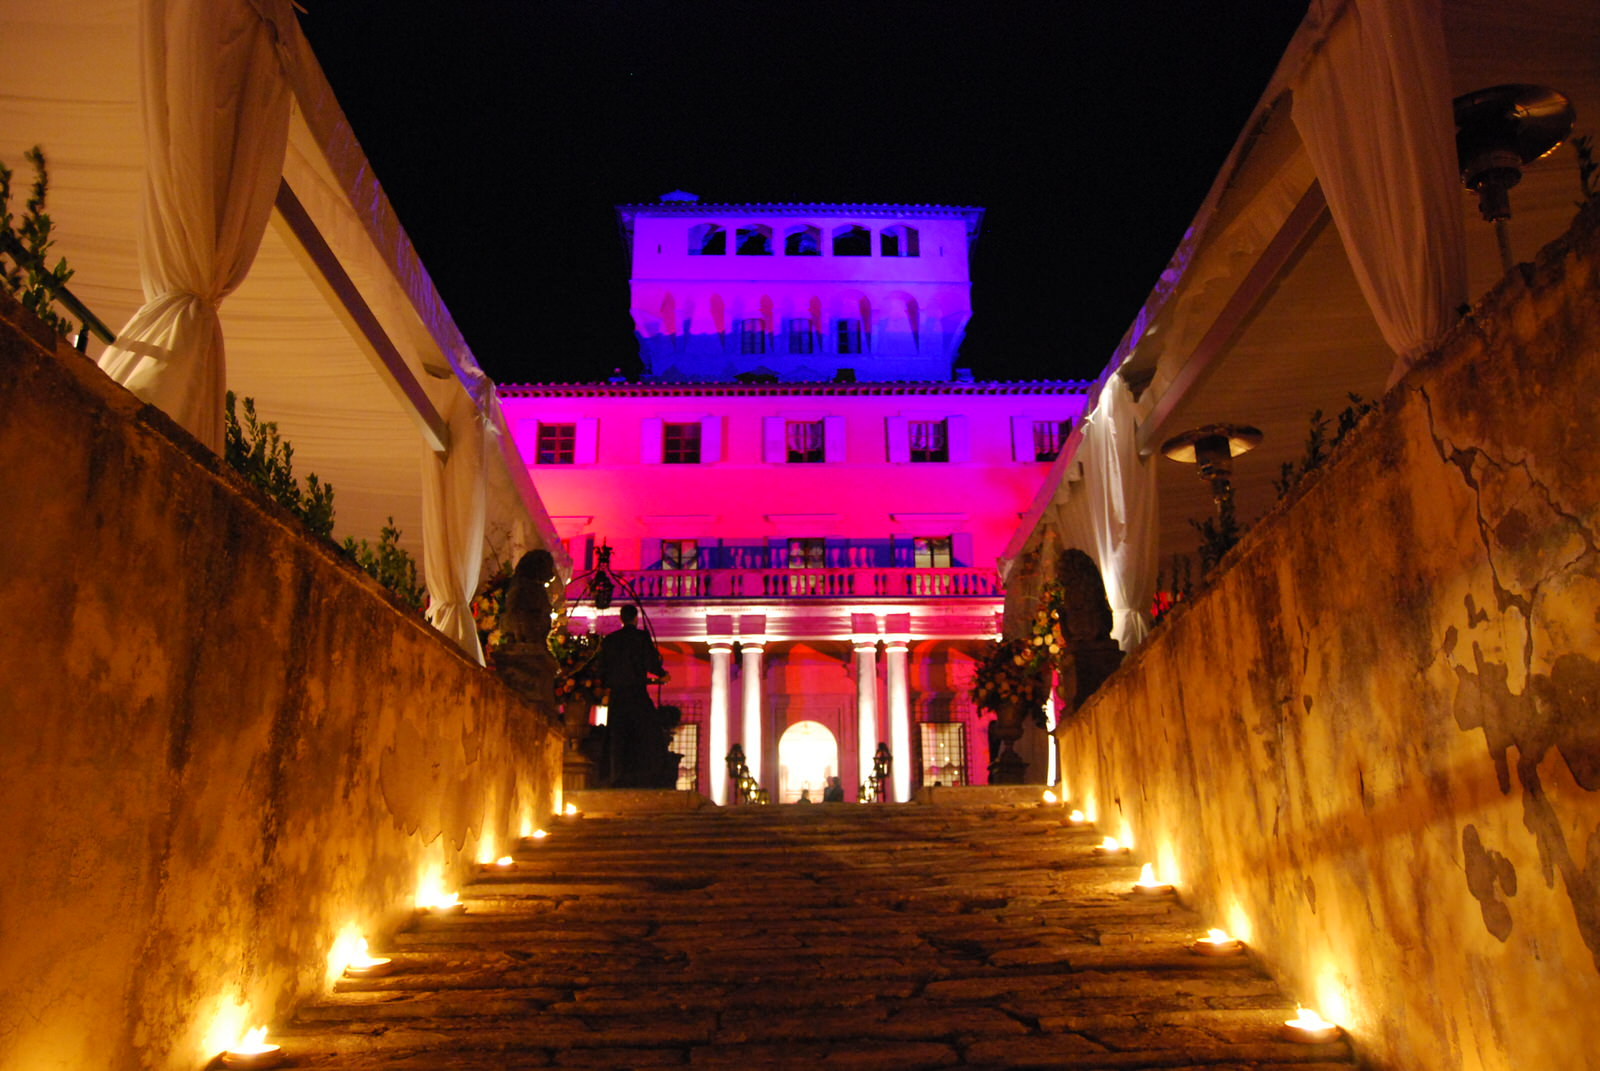 tuscany-wedding-planners-lightsound-01.jpg